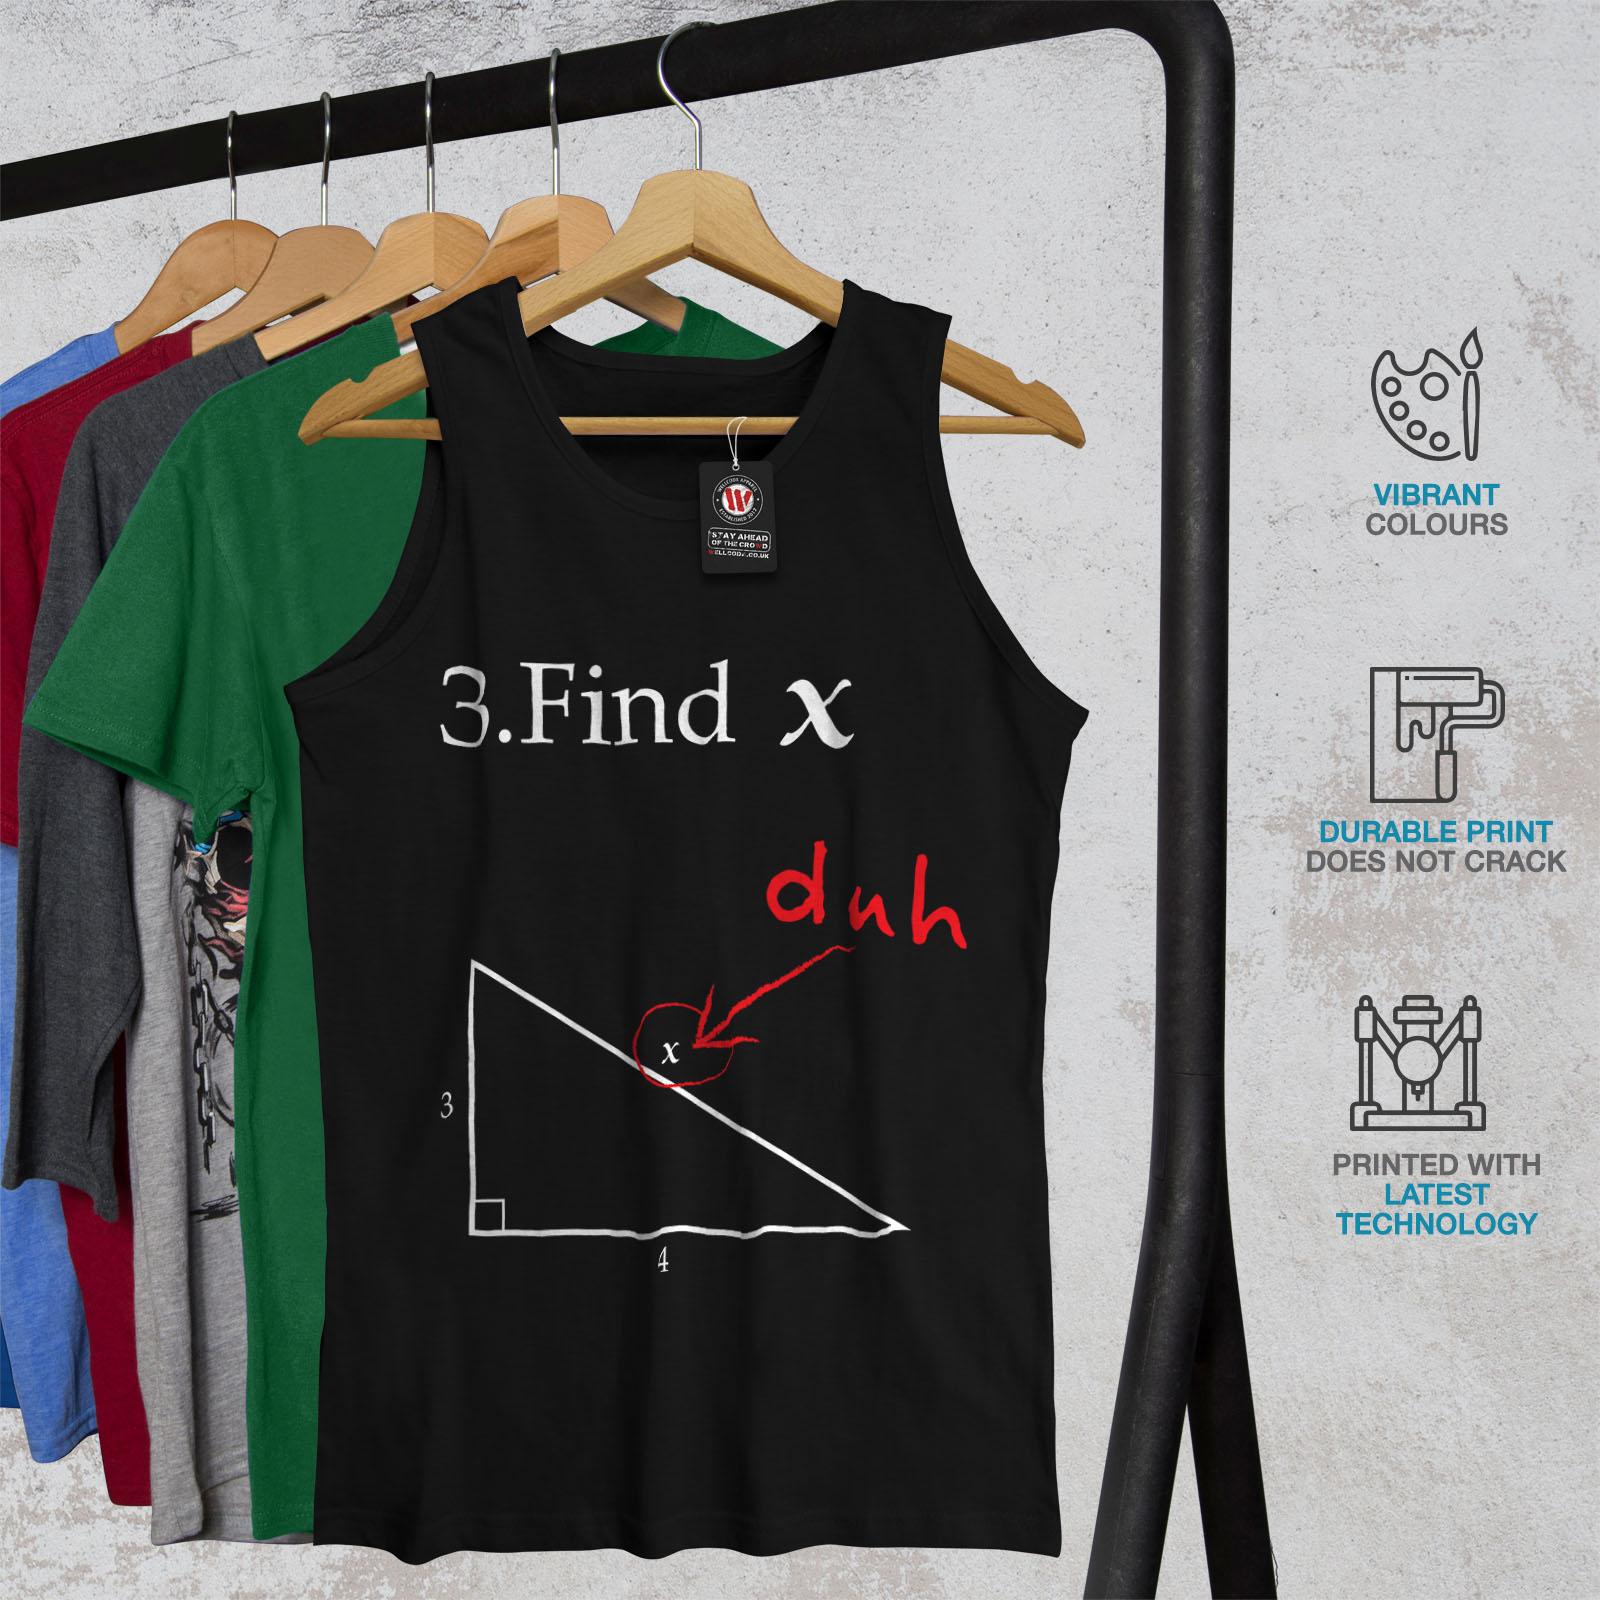 Wellcoda-trouver-X-Homme-Tank-Top-Drole-Math-Active-Sports-Shirt miniature 4